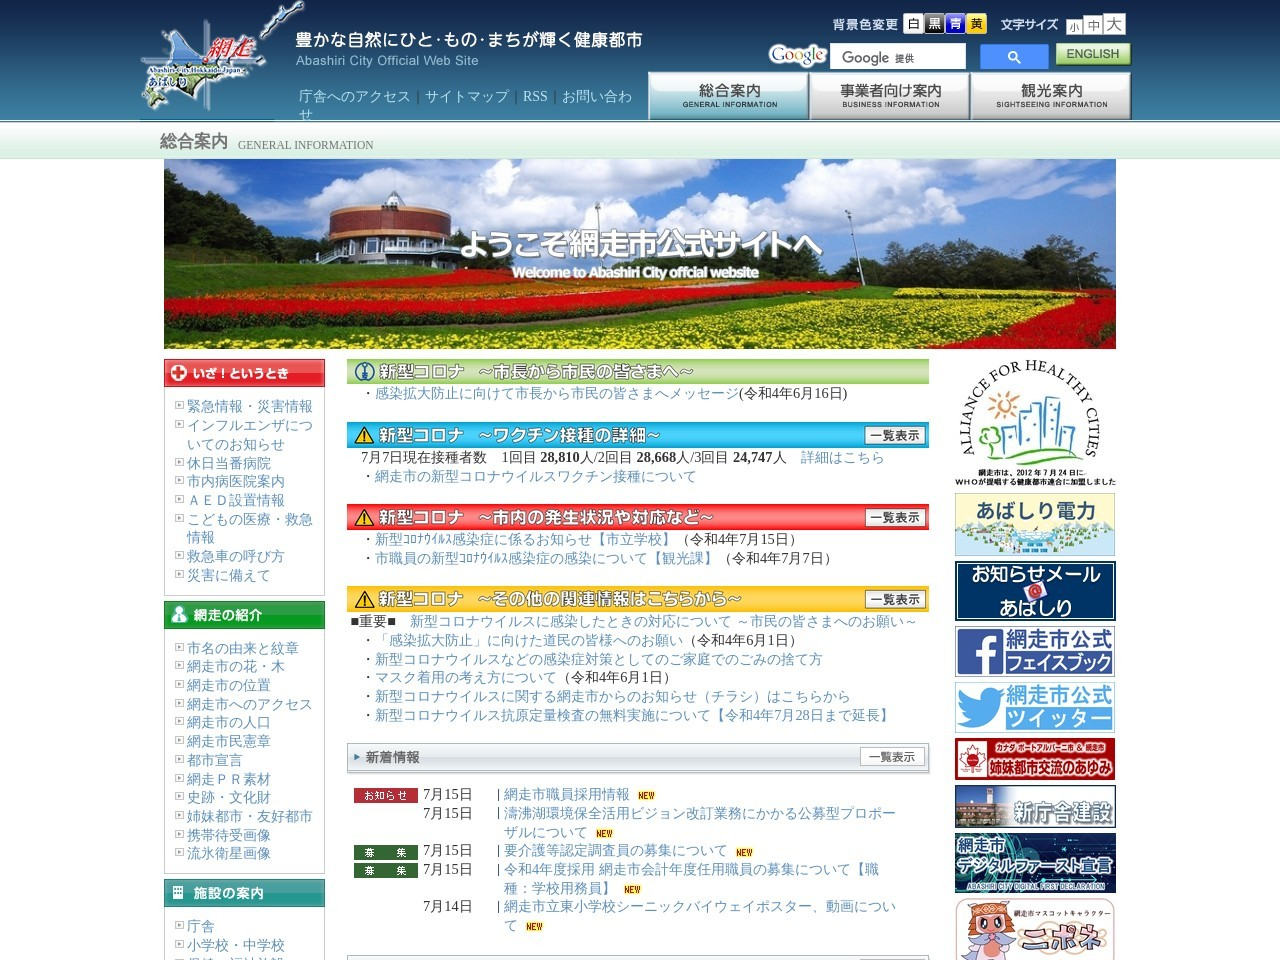 http://www.city.abashiri.hokkaido.jp/270kyoiku/025geijutubunka/020echocen2000/H30/uehara-ayako.html